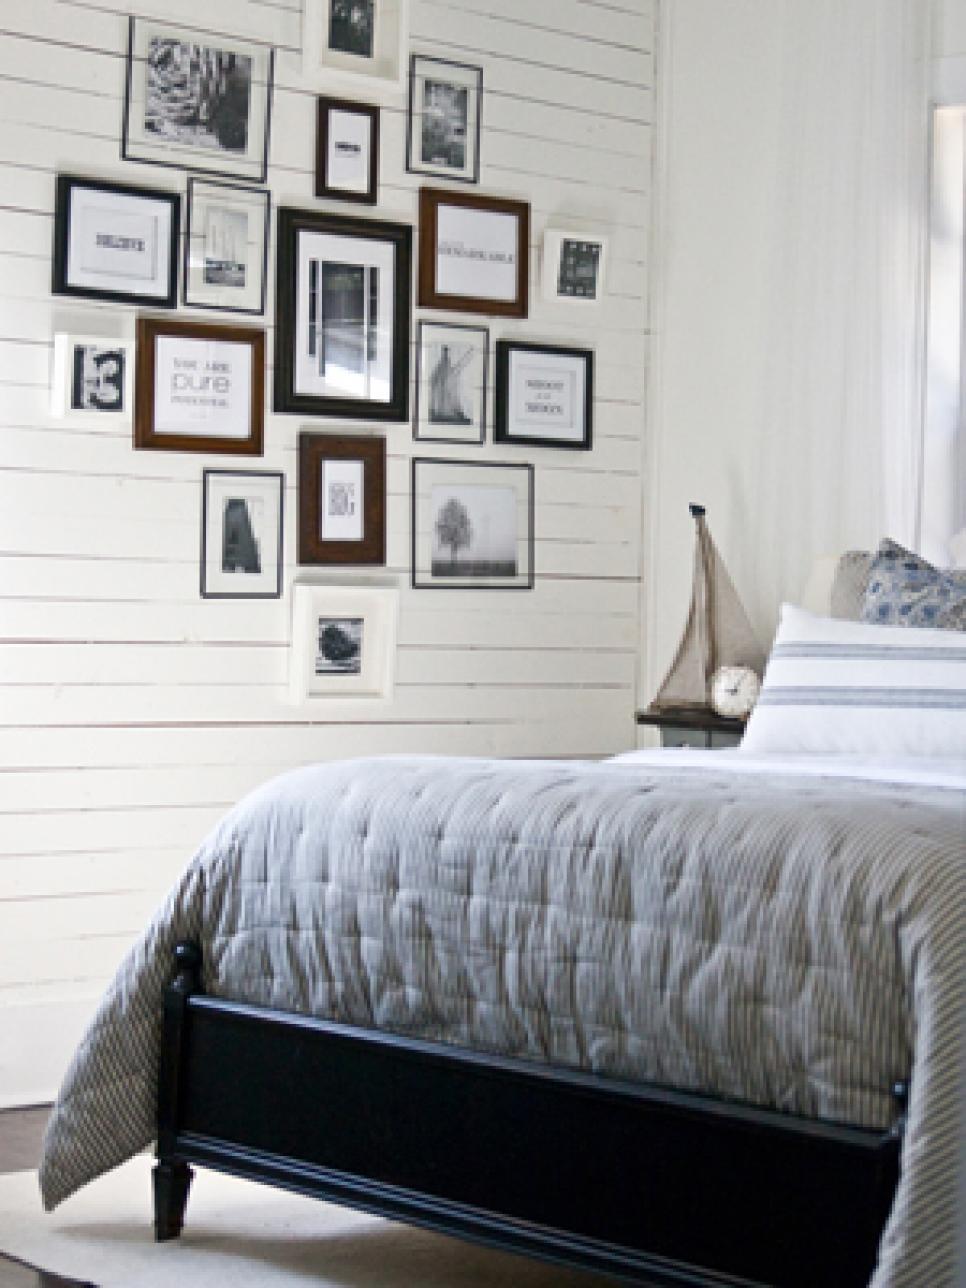 10 Ways To Display Bedroom Frames | Hgtv In Bedroom Framed Wall Art (Image 1 of 20)